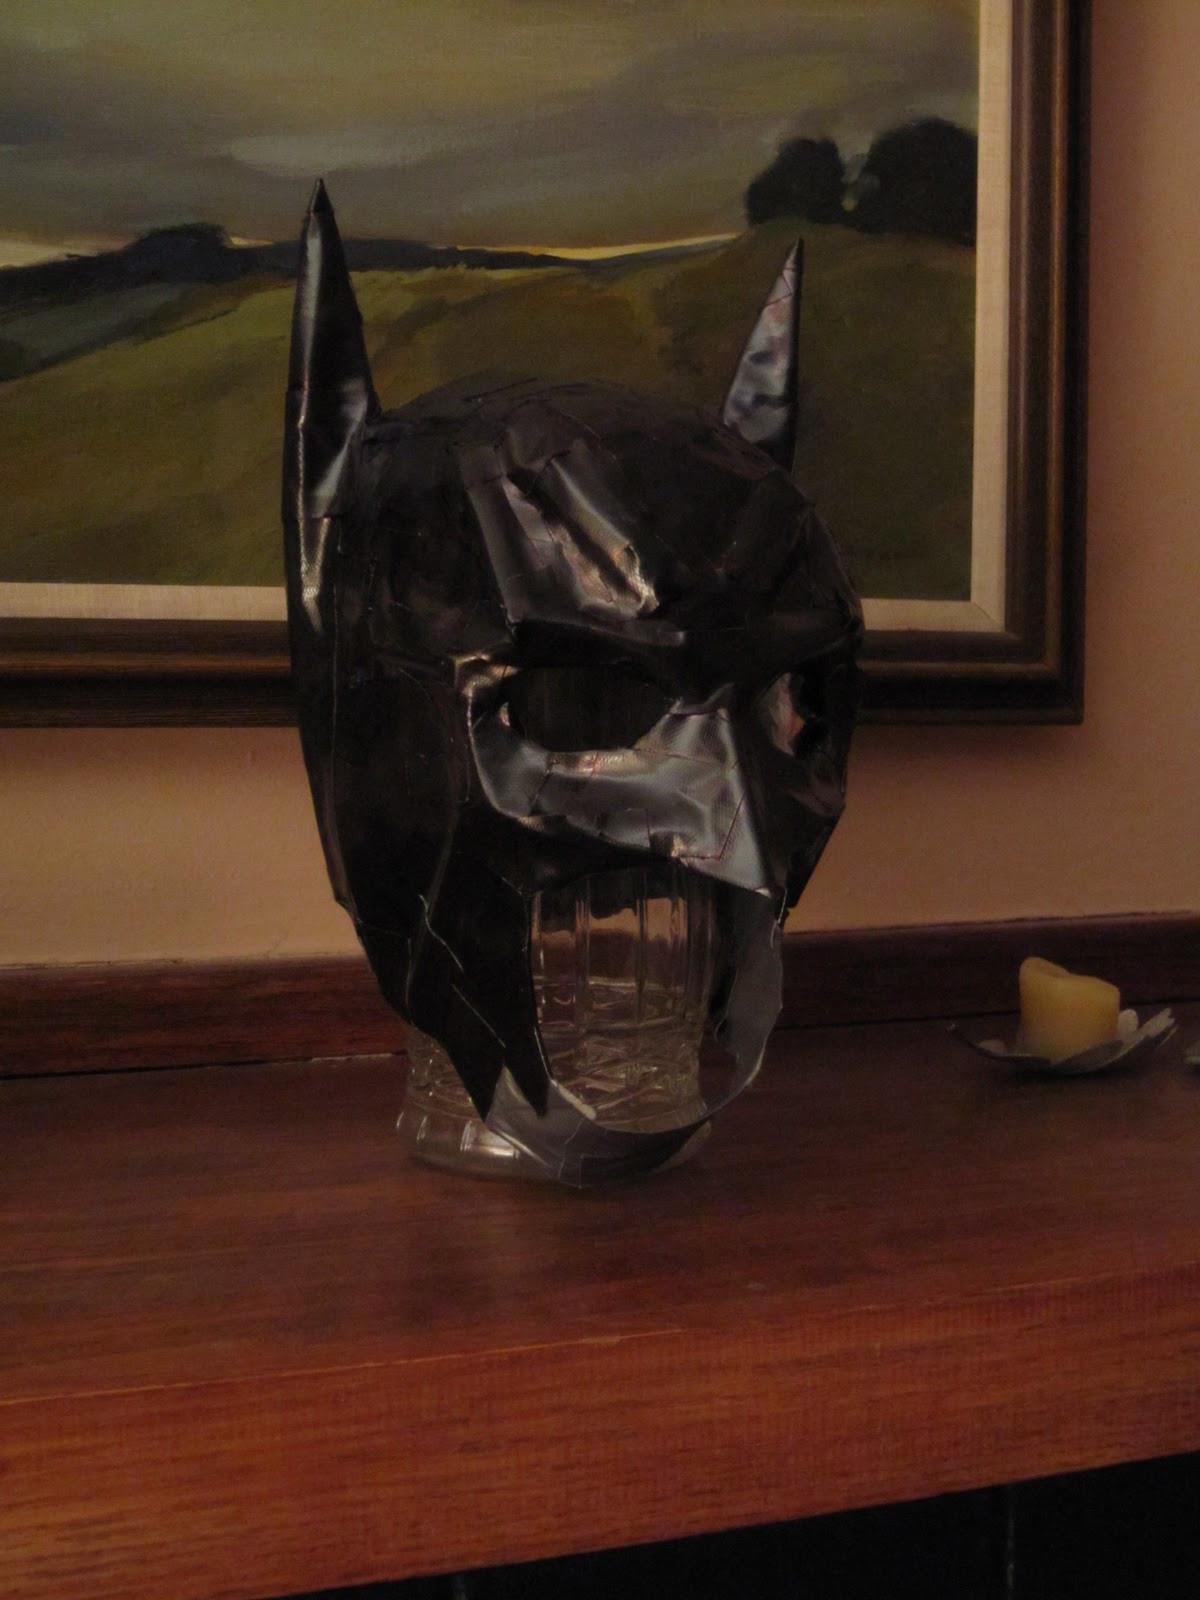 Best ideas about Batman Mask DIY . Save or Pin Chuck Does Art DIY Batman Costume Now.